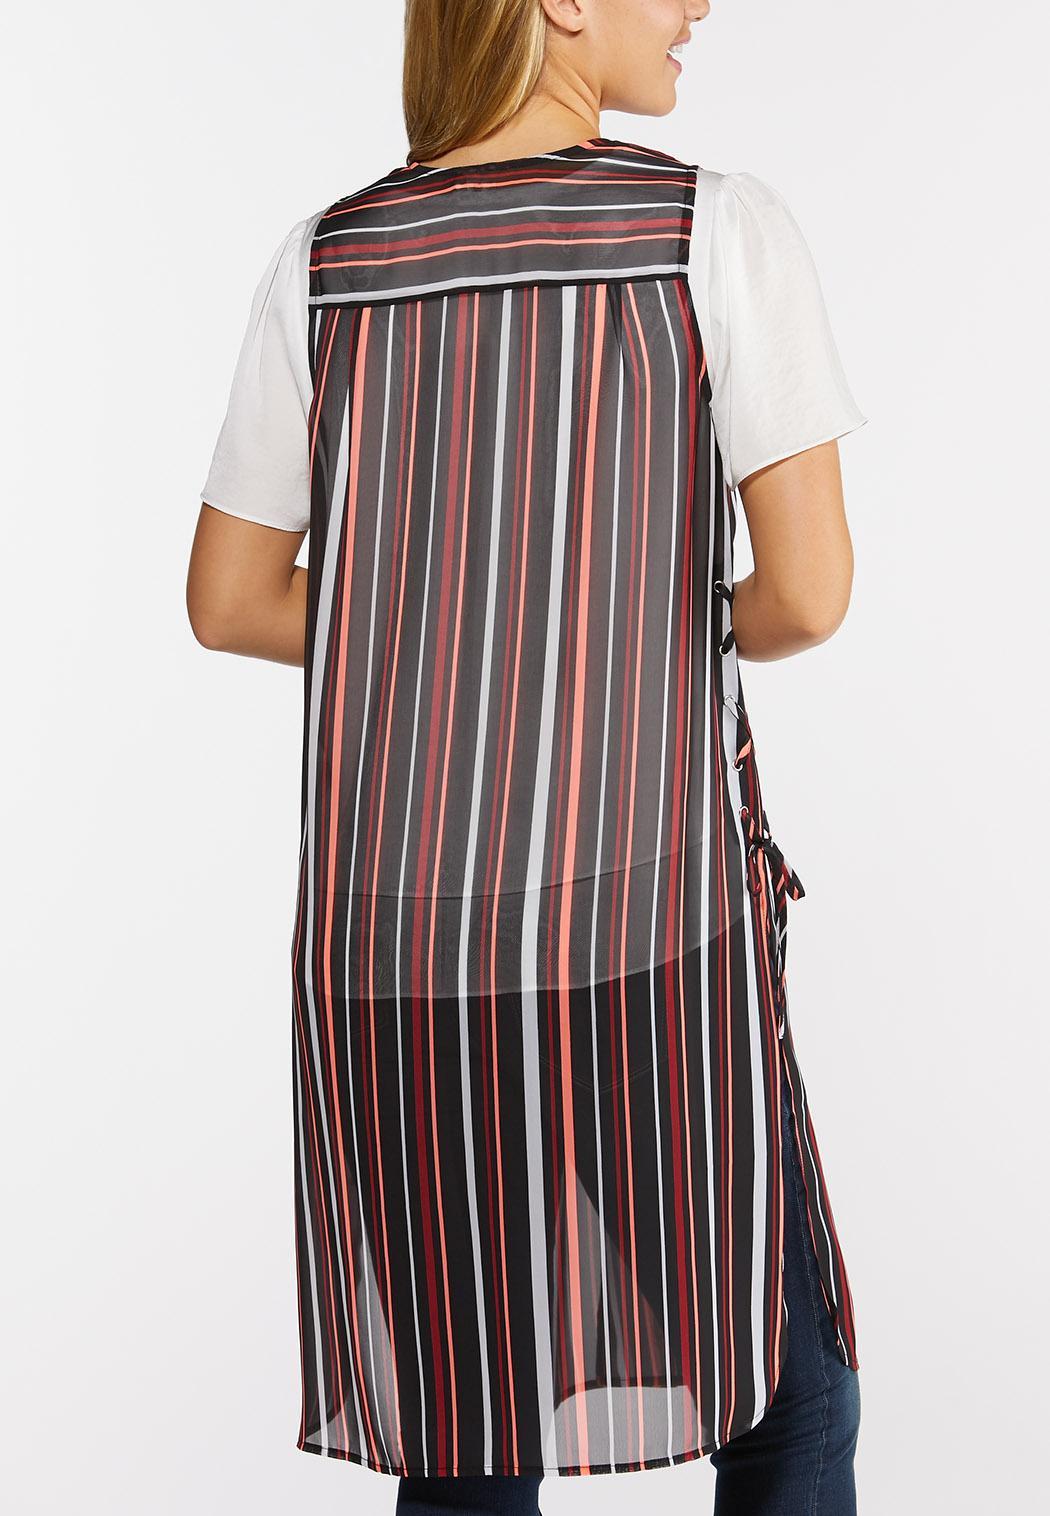 Plus Size Summer Sheer Print Vest (Item #44335858)